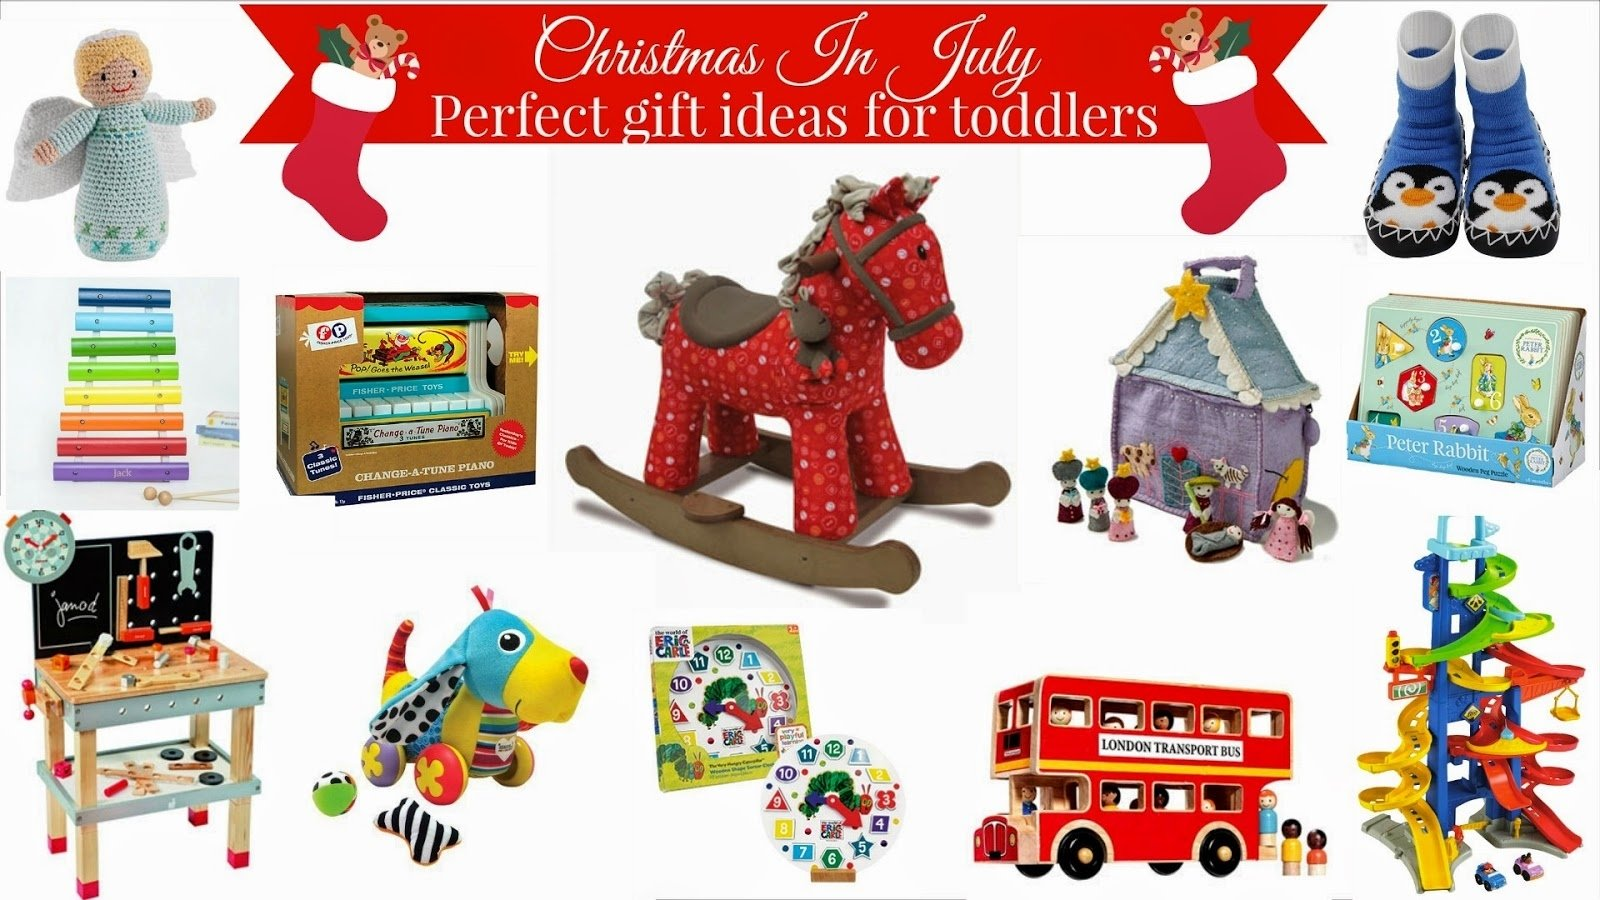 10 Gorgeous Christmas Gift Ideas For Toddlers christmas in july perfect gift ideas for toddlers e299a5 dolly dowsie 1 2021